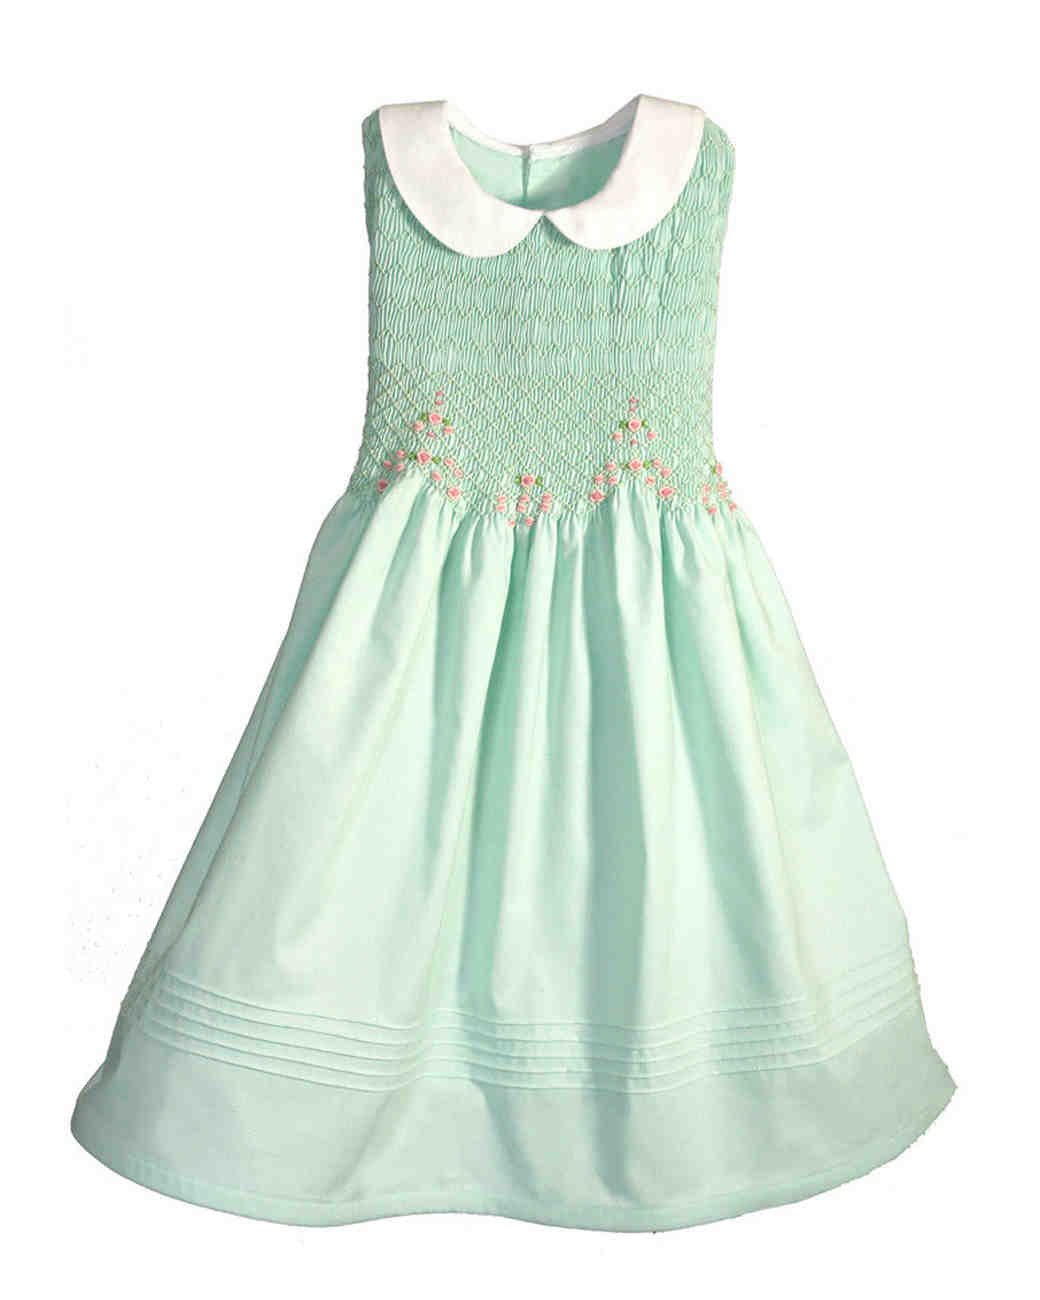 22 Flower Girl Dresses For A Spring Wedding Martha Stewart Weddings